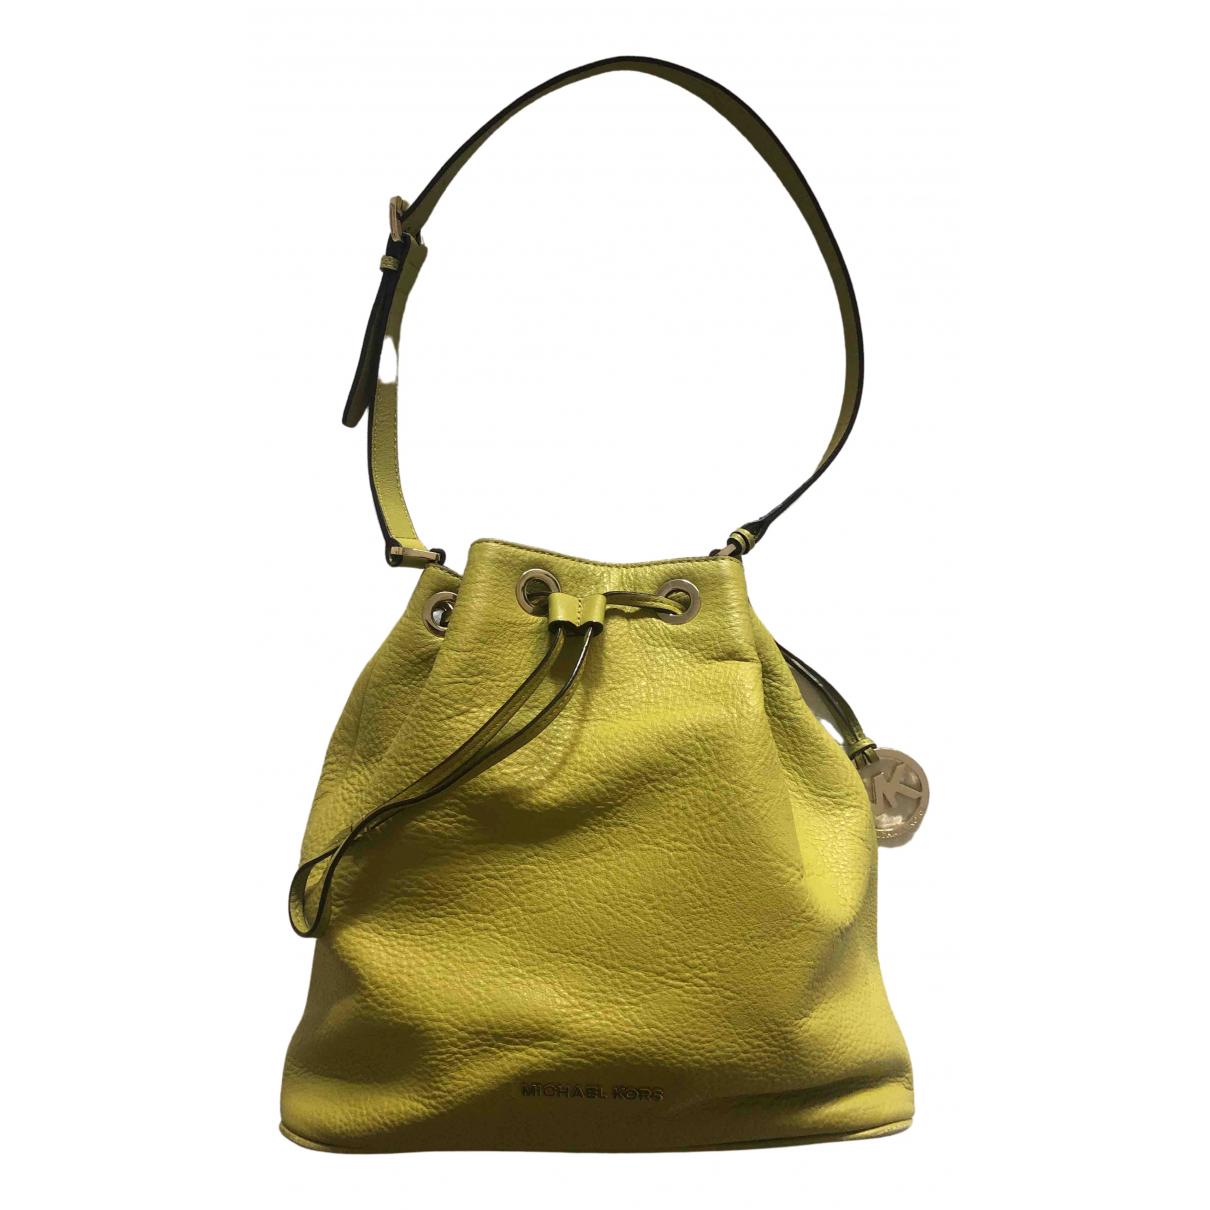 Michael Kors \N Yellow Leather handbag for Women \N